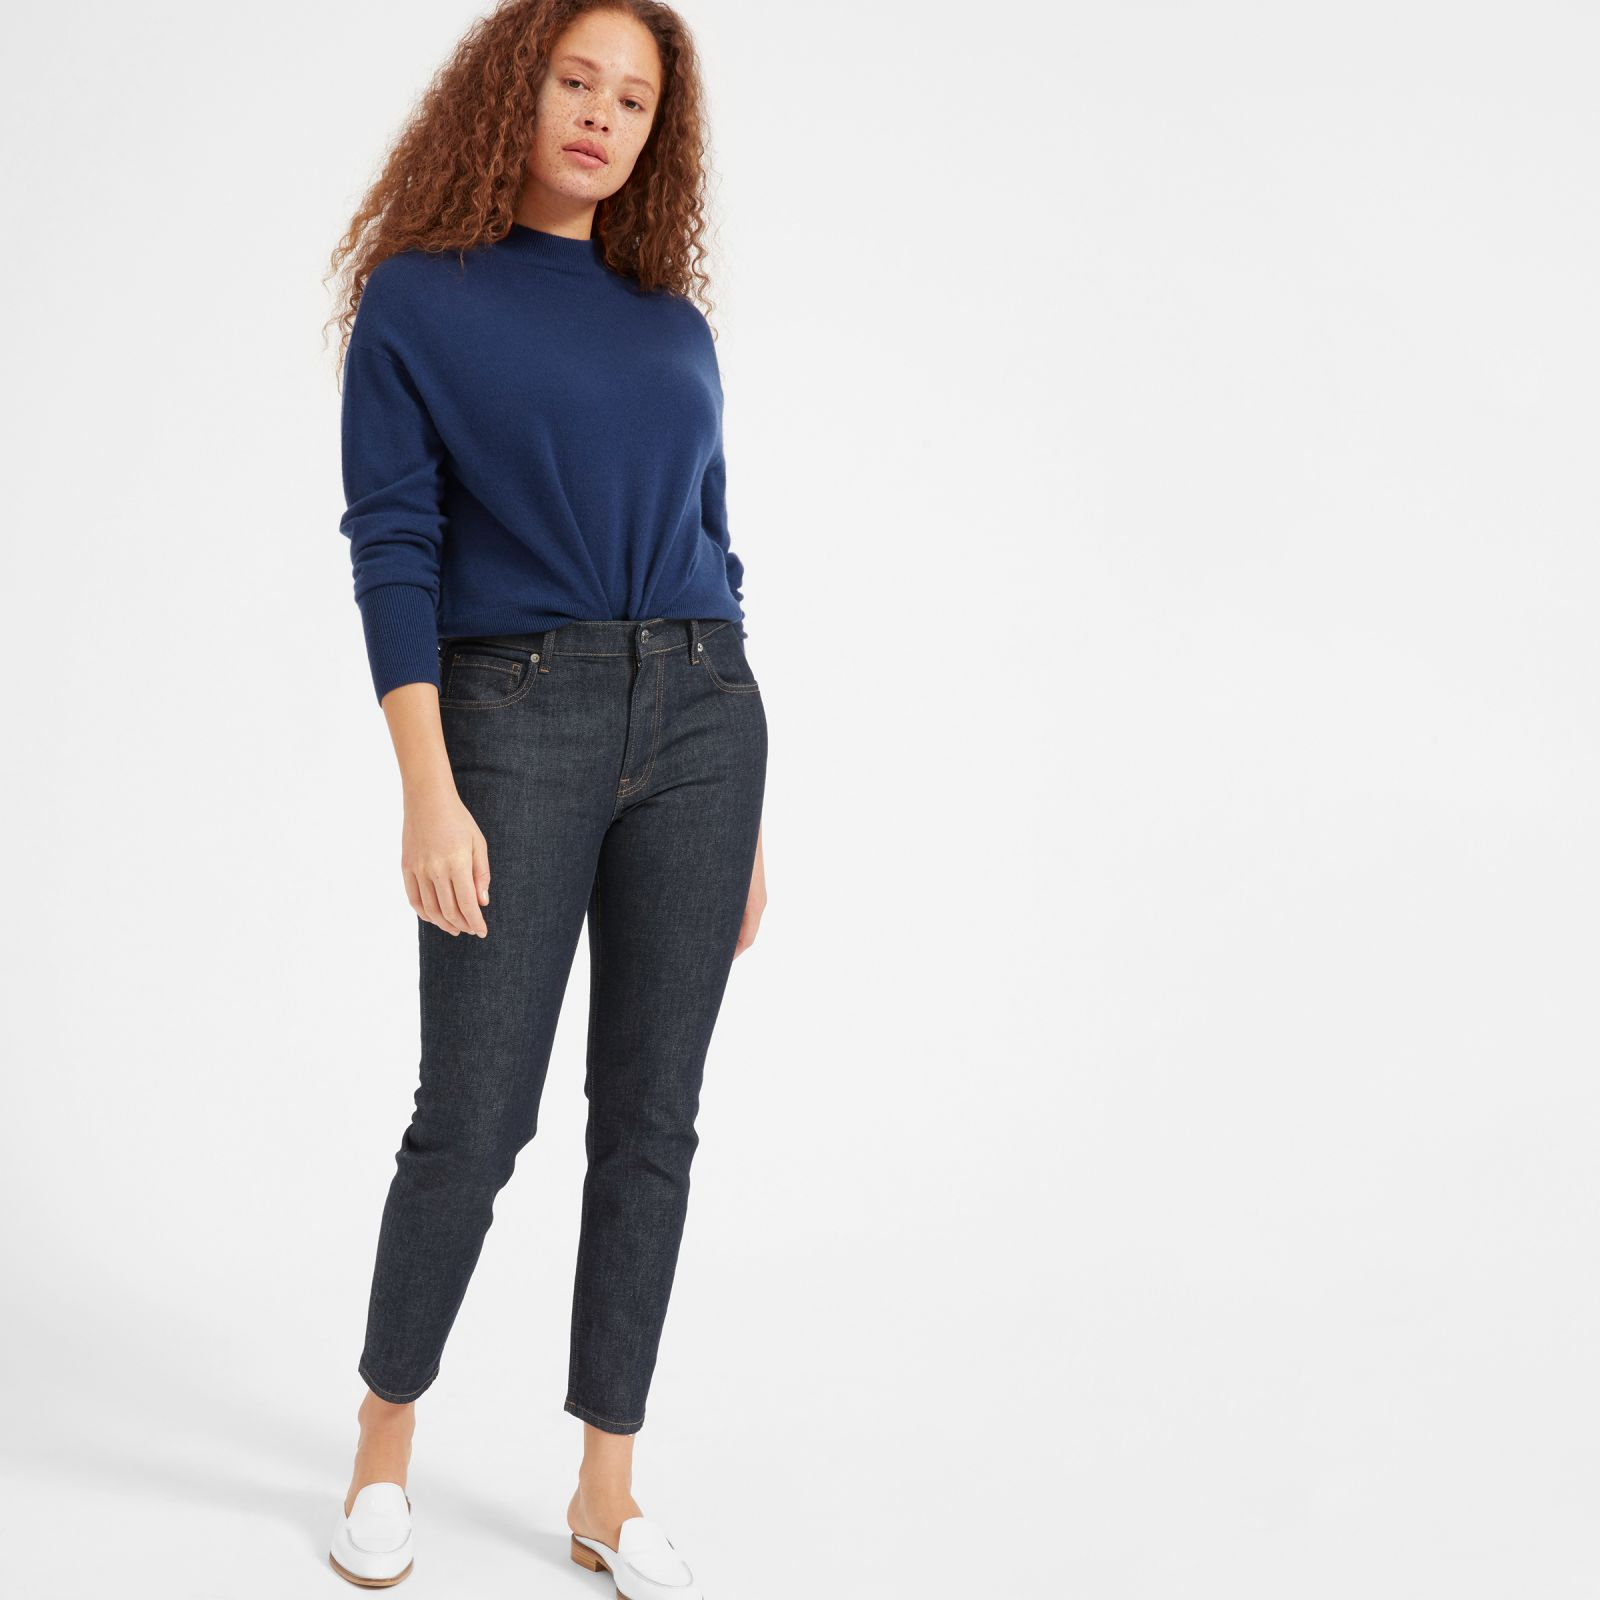 women's mid-rise skinny jean by everlane in dark indigo, size 23